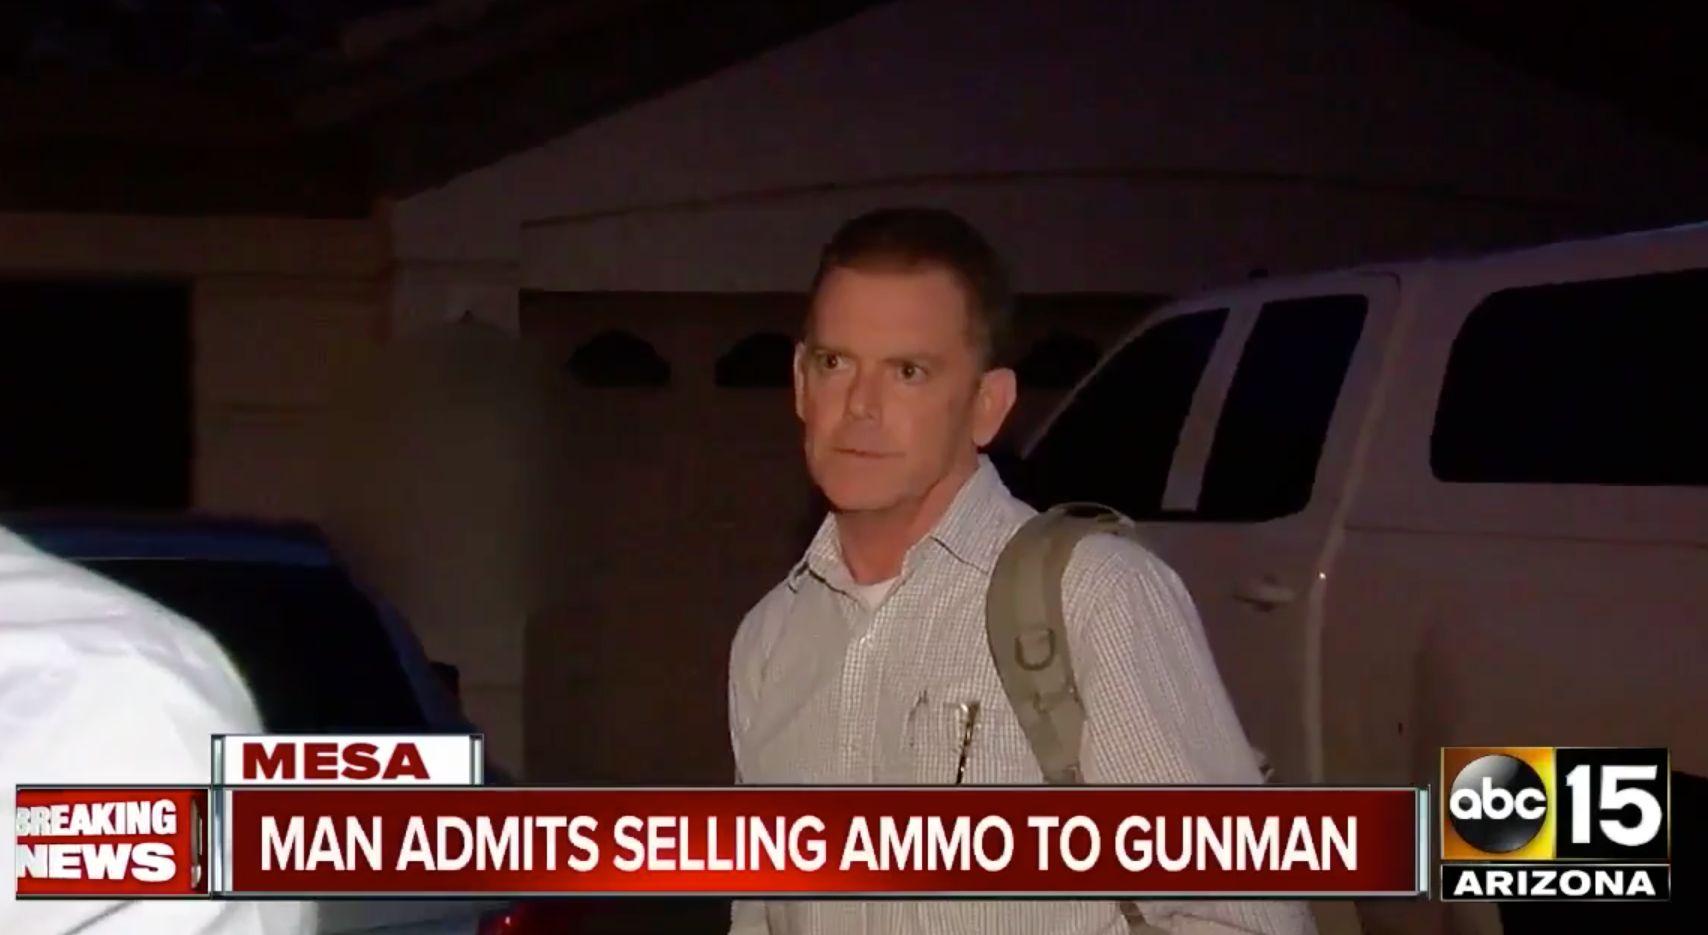 Douglas Haig has admitted to selling Las Vegas gunman Stephen Paddock rounds of ammunition but denies having known him.